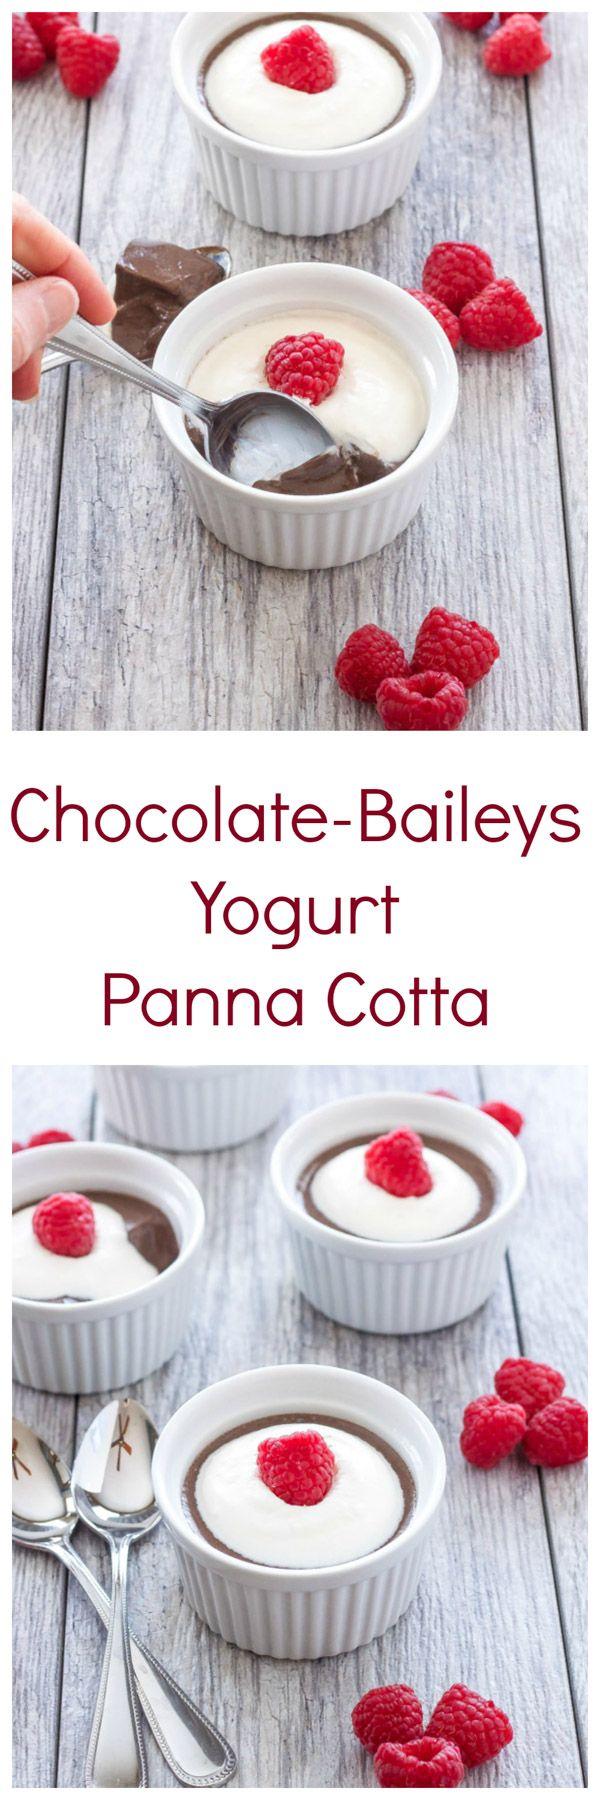 Chocolate-Baileys Yogurt Panna Cotta | Chocolate panna cotta spiked with Baileys Irish cream! | @reciperunner